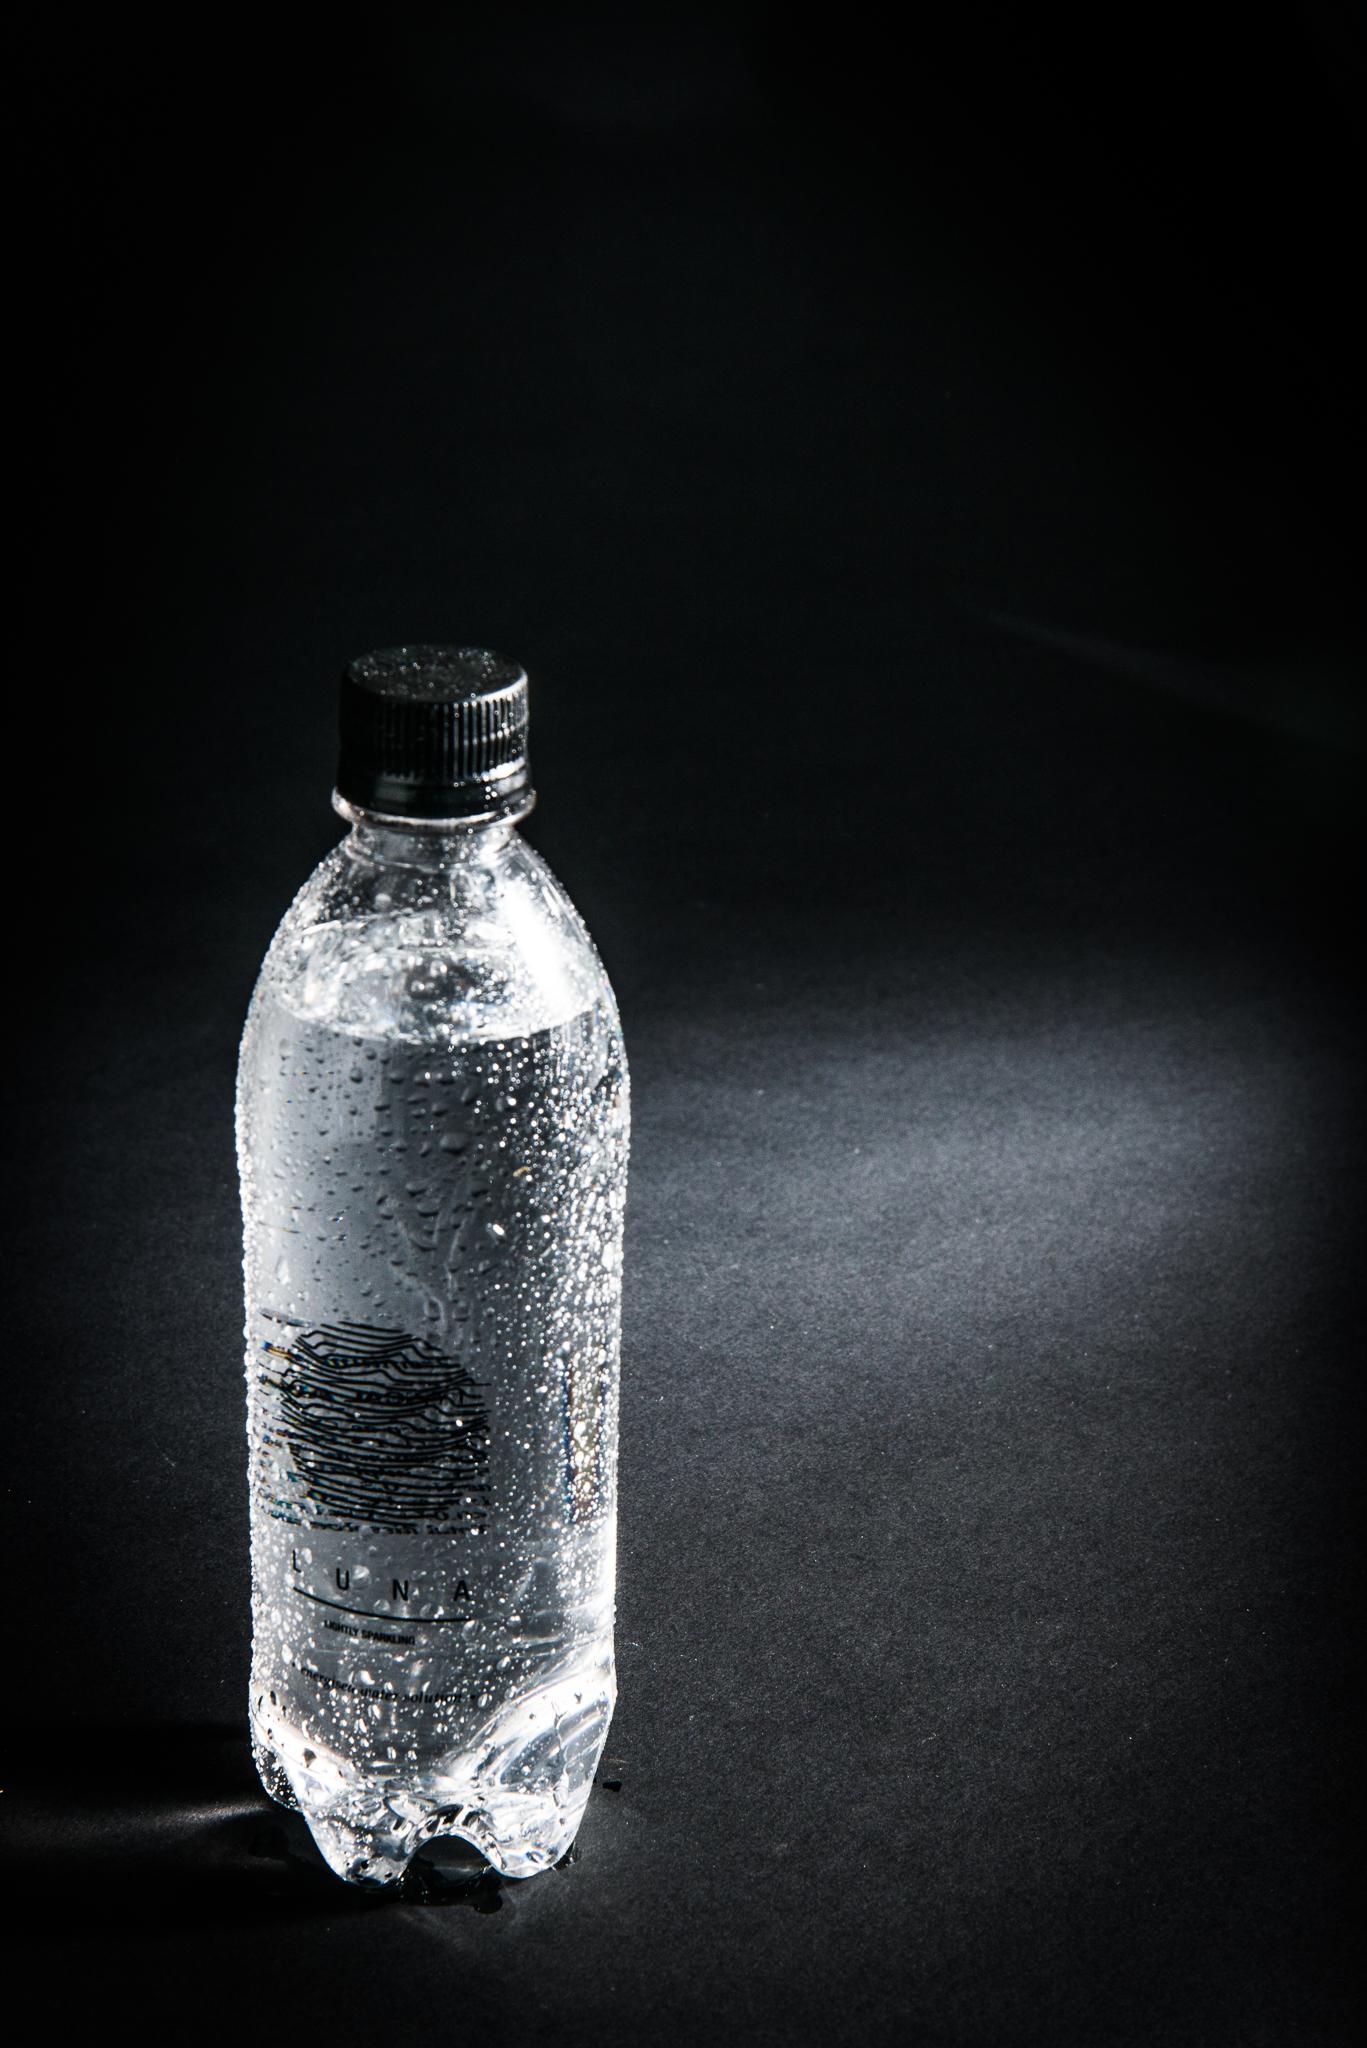 LUNA Water00009.jpg